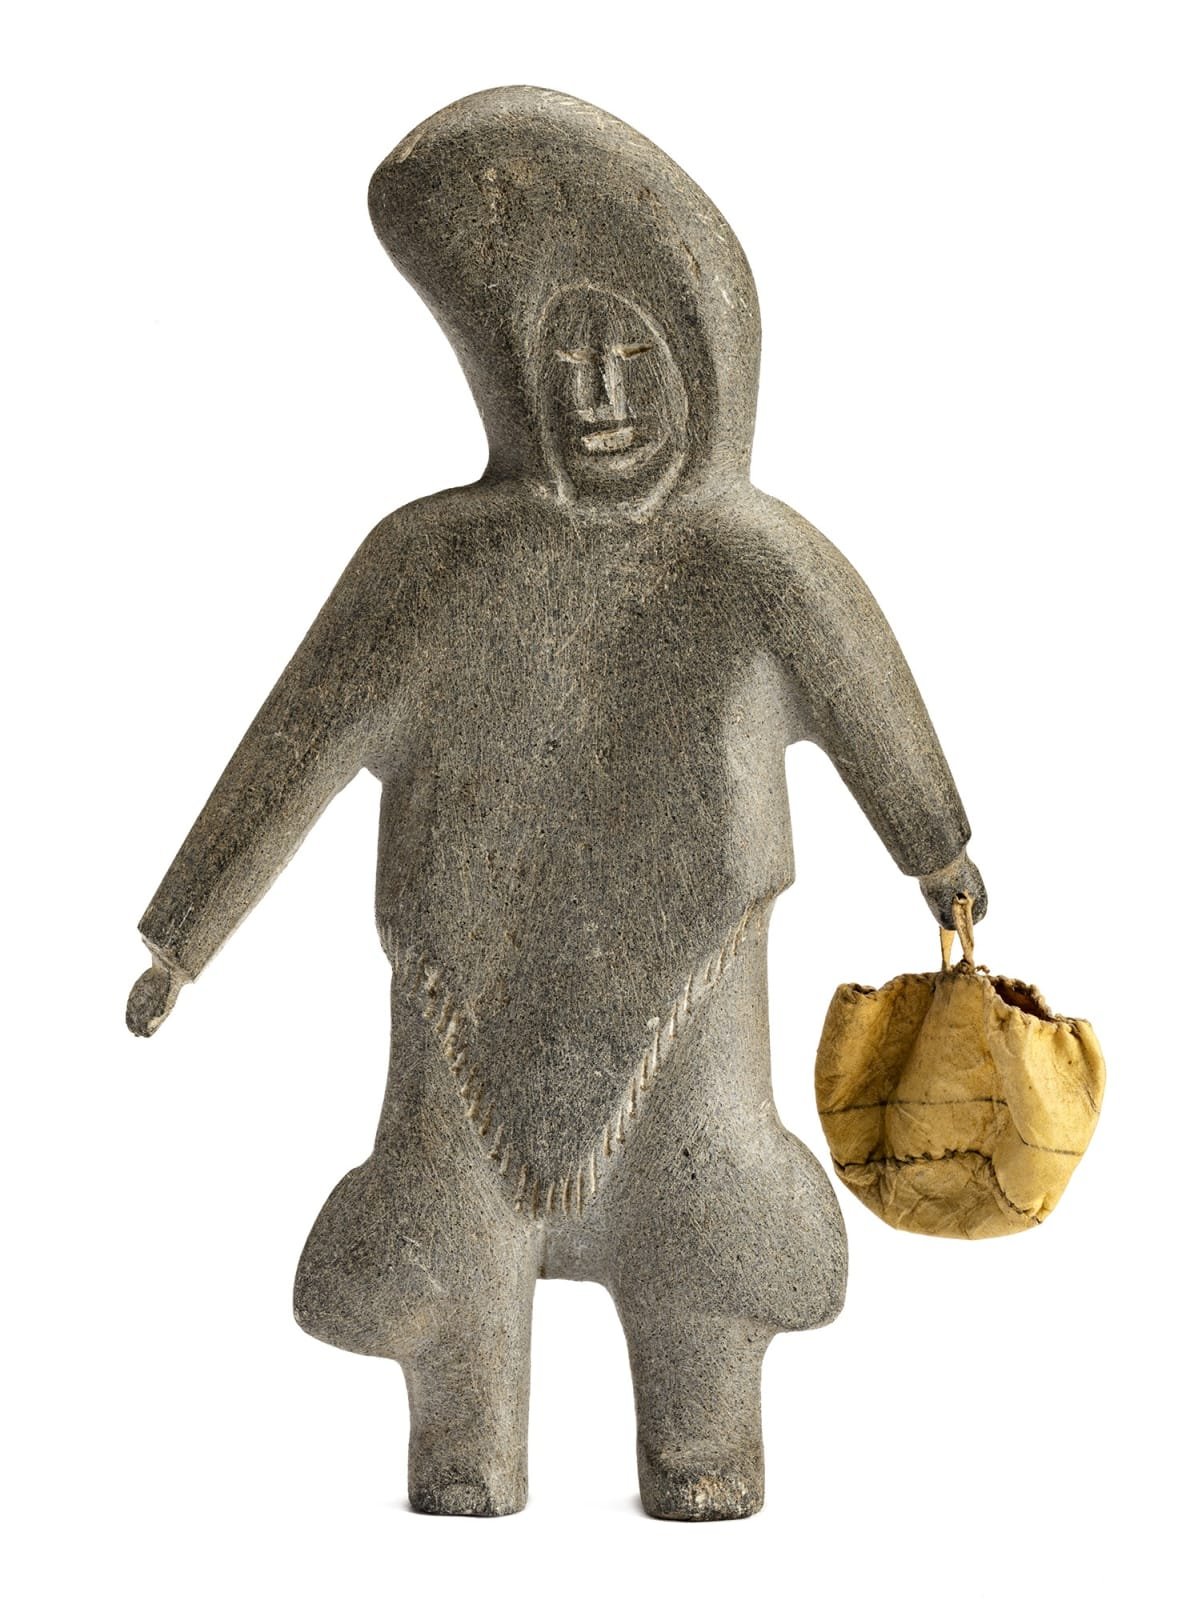 Lot 29 MARGARET UYAUPERQ ANIKSAK (1905-1993) ARVIAT (ESKIMO POINT) Standing Woman with Skin Bag, c. 1967-68 stone, skin, and sinew, 8.25 x 4.75 x 1.25 in (21 x 12.1 x 3.2 cm) Estimate: $1,200 — $1,800